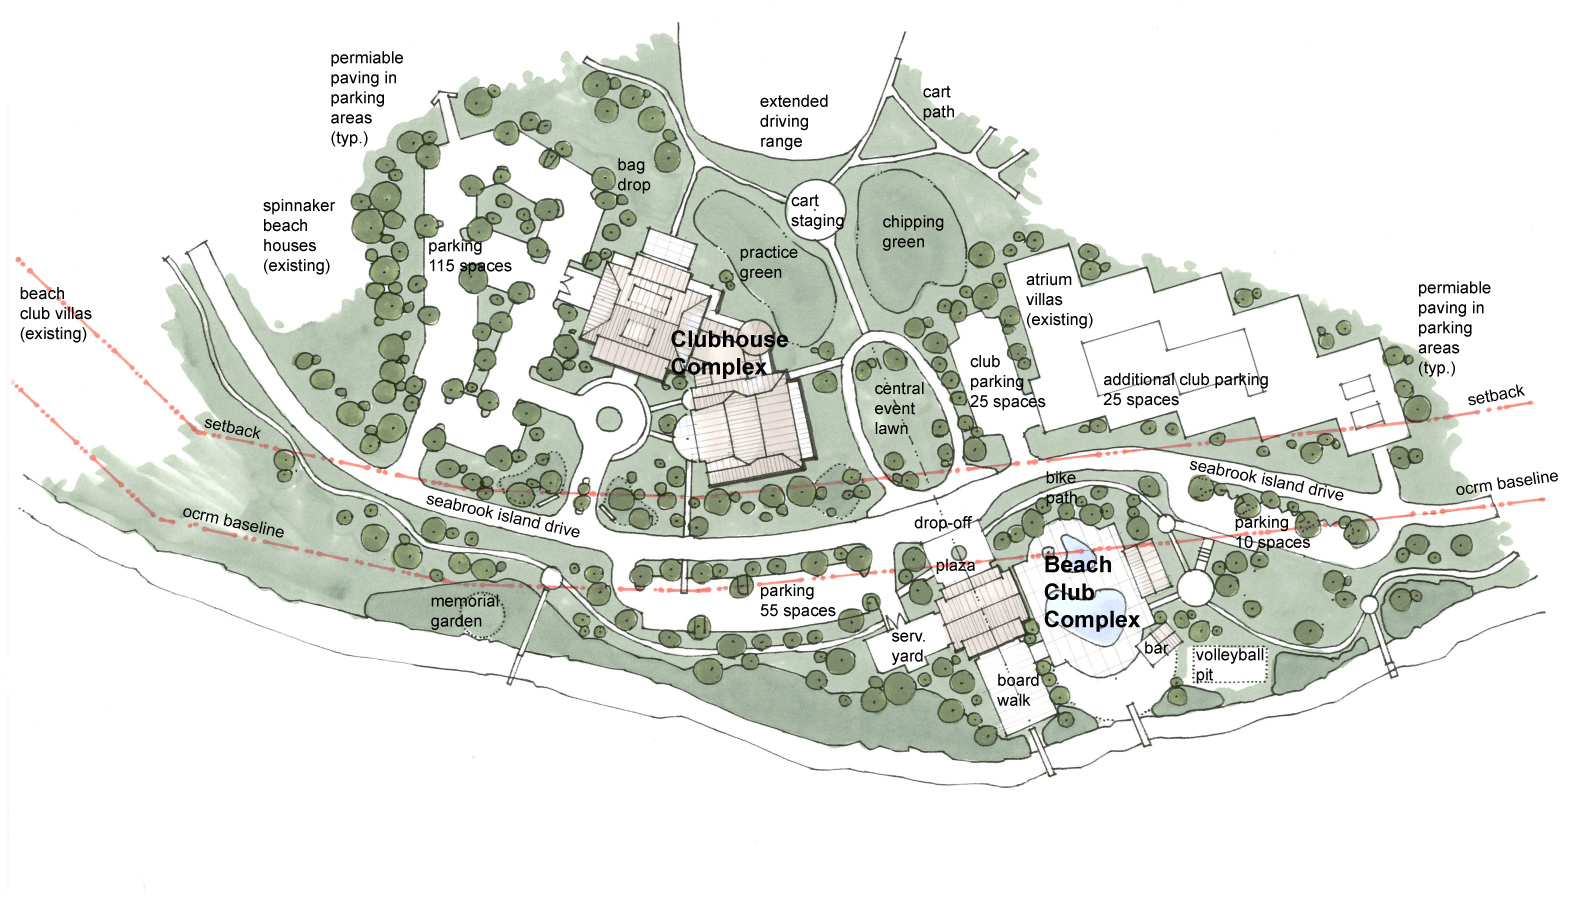 Seabrook Island_Plan.jpg